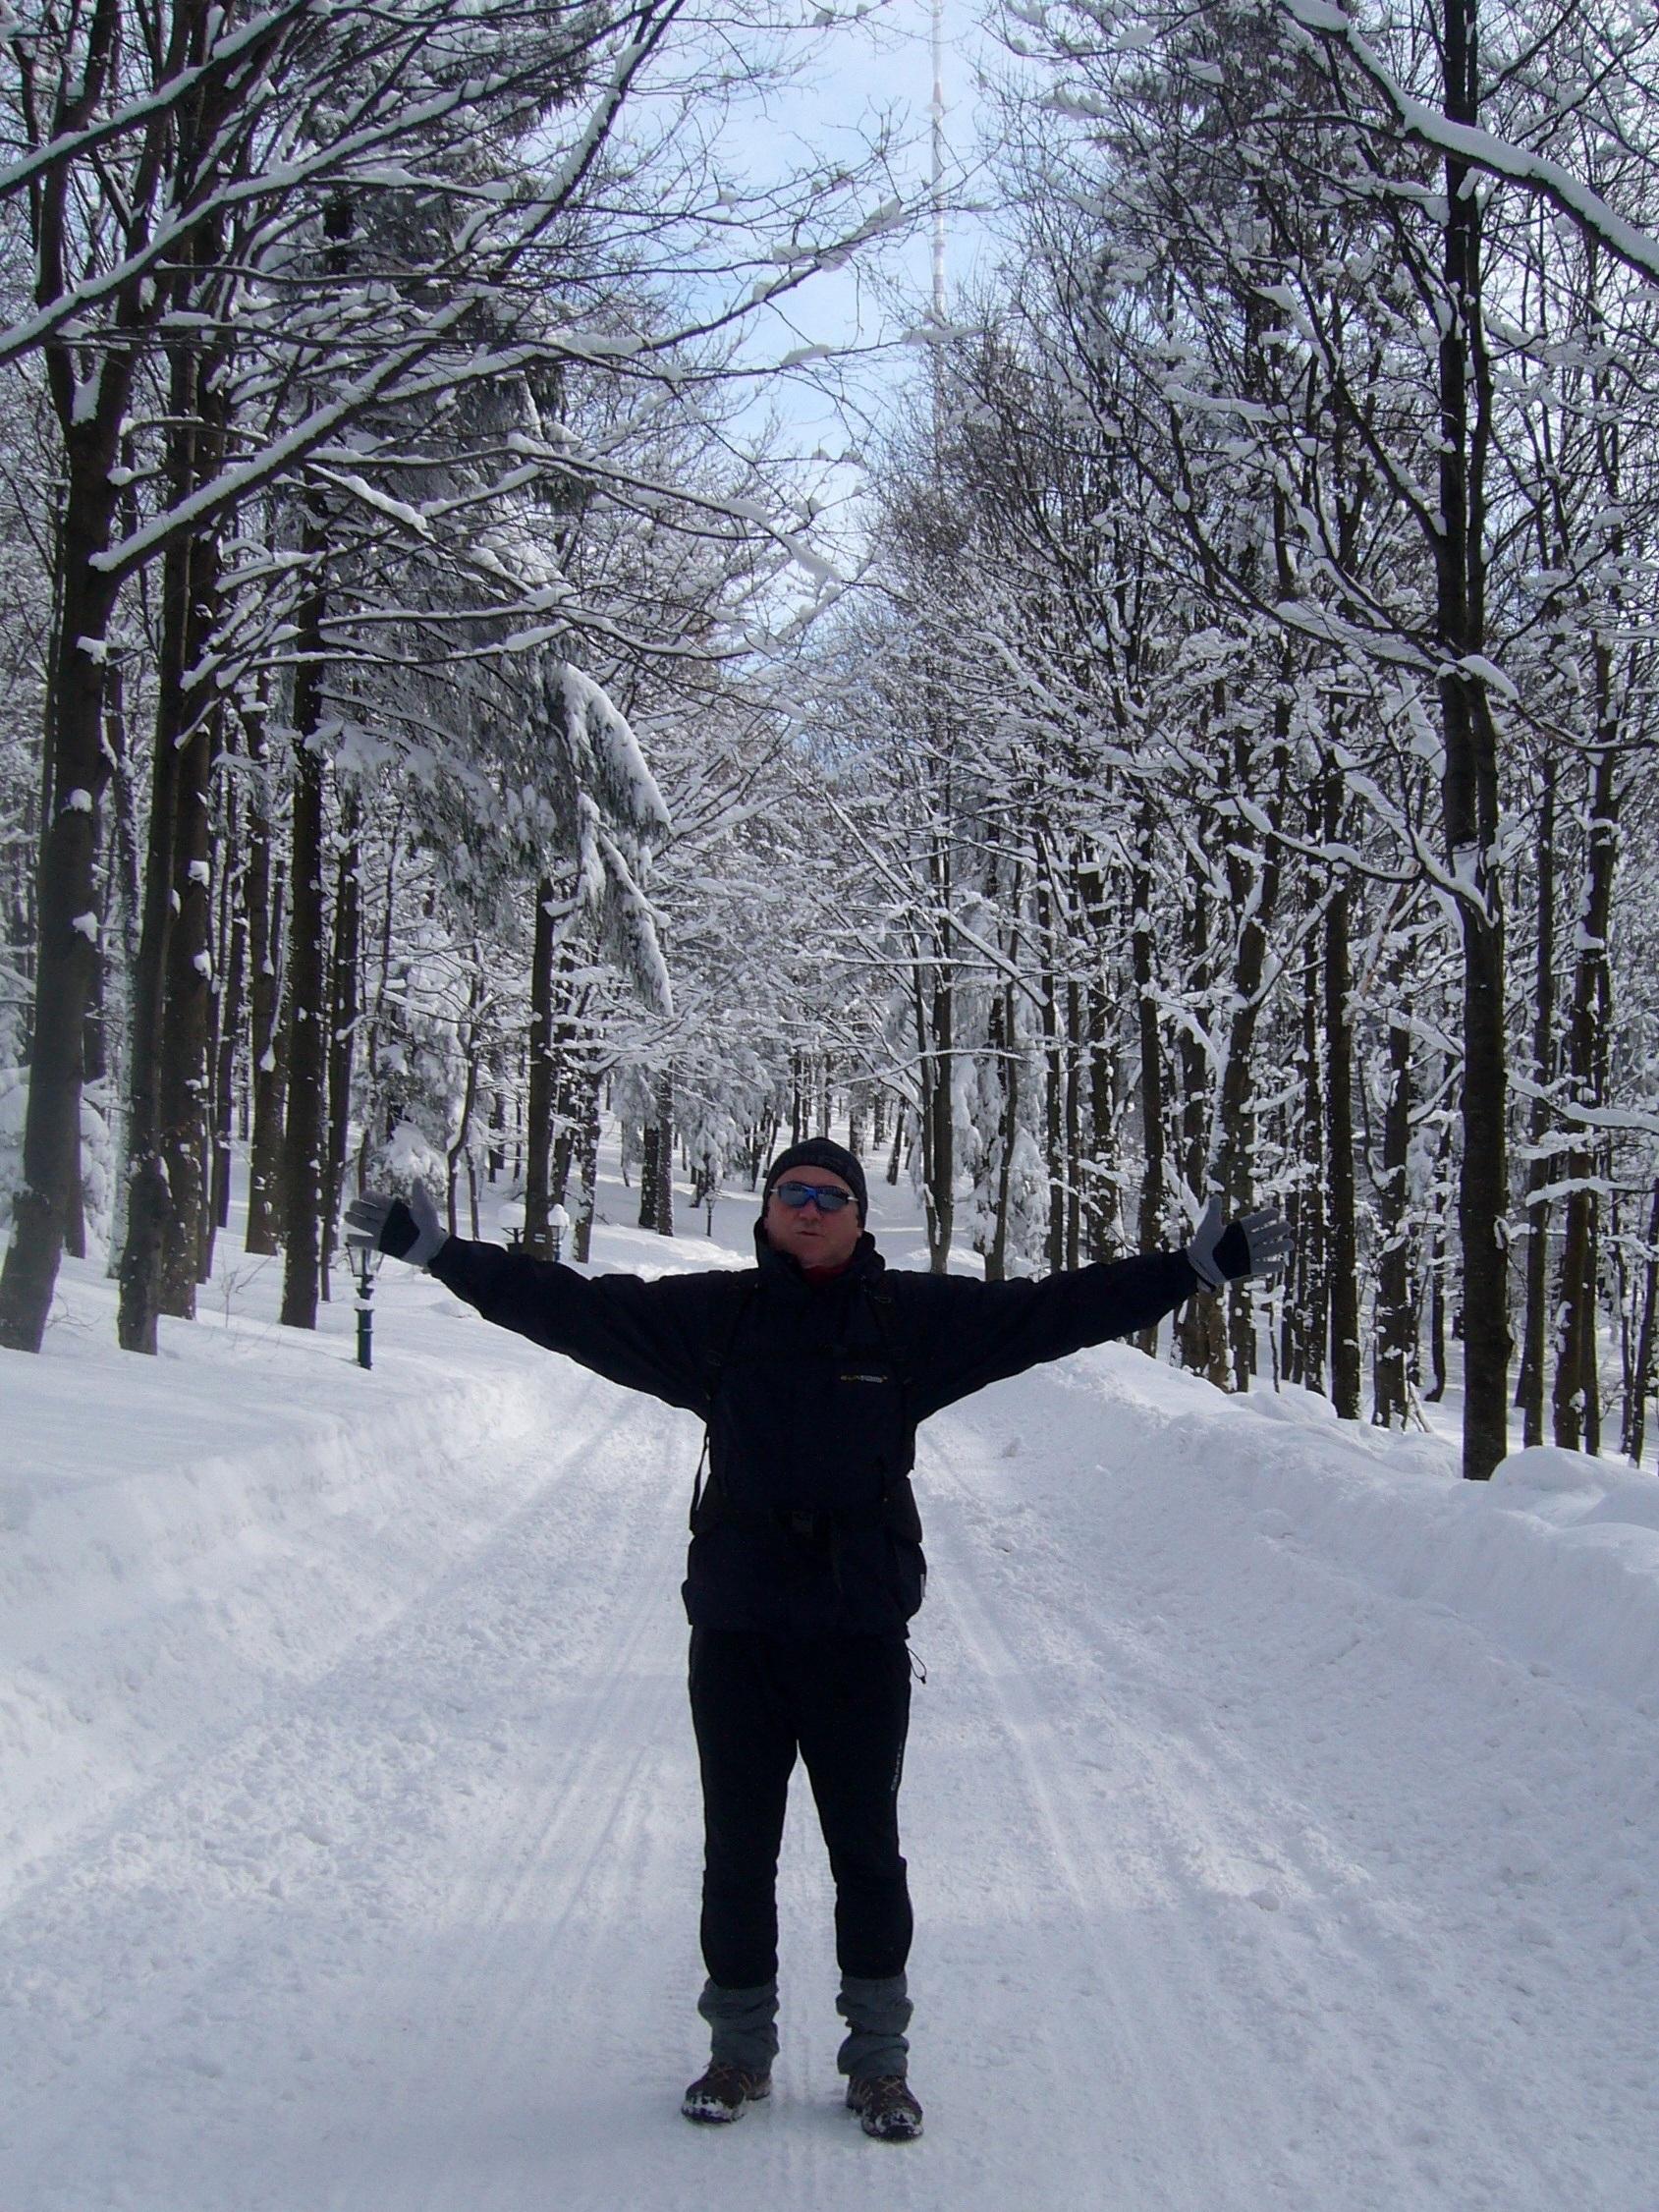 Фото мужчина зимой в лесу